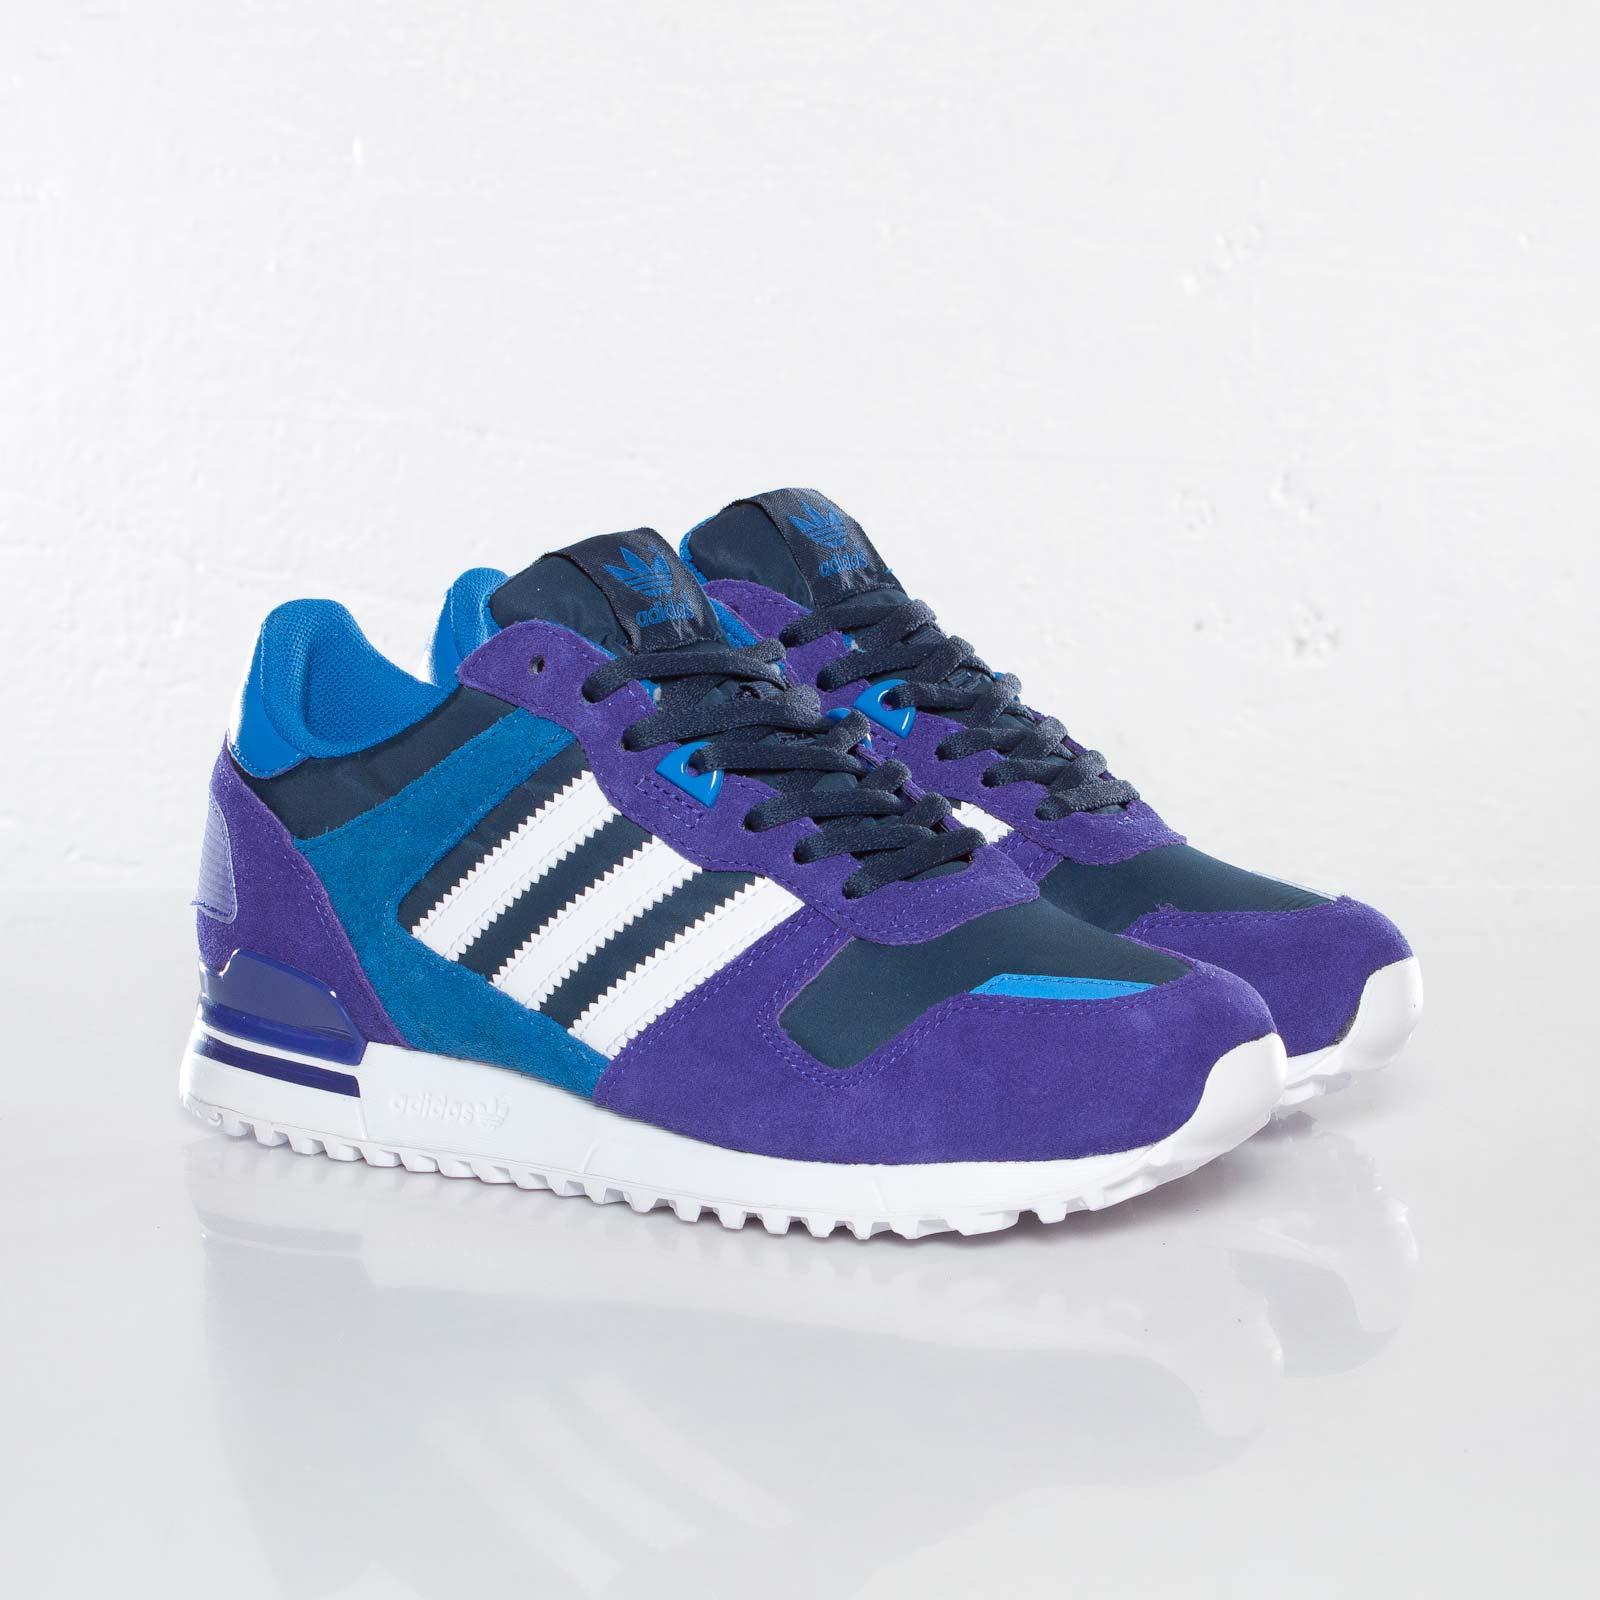 adidas zx 700 j